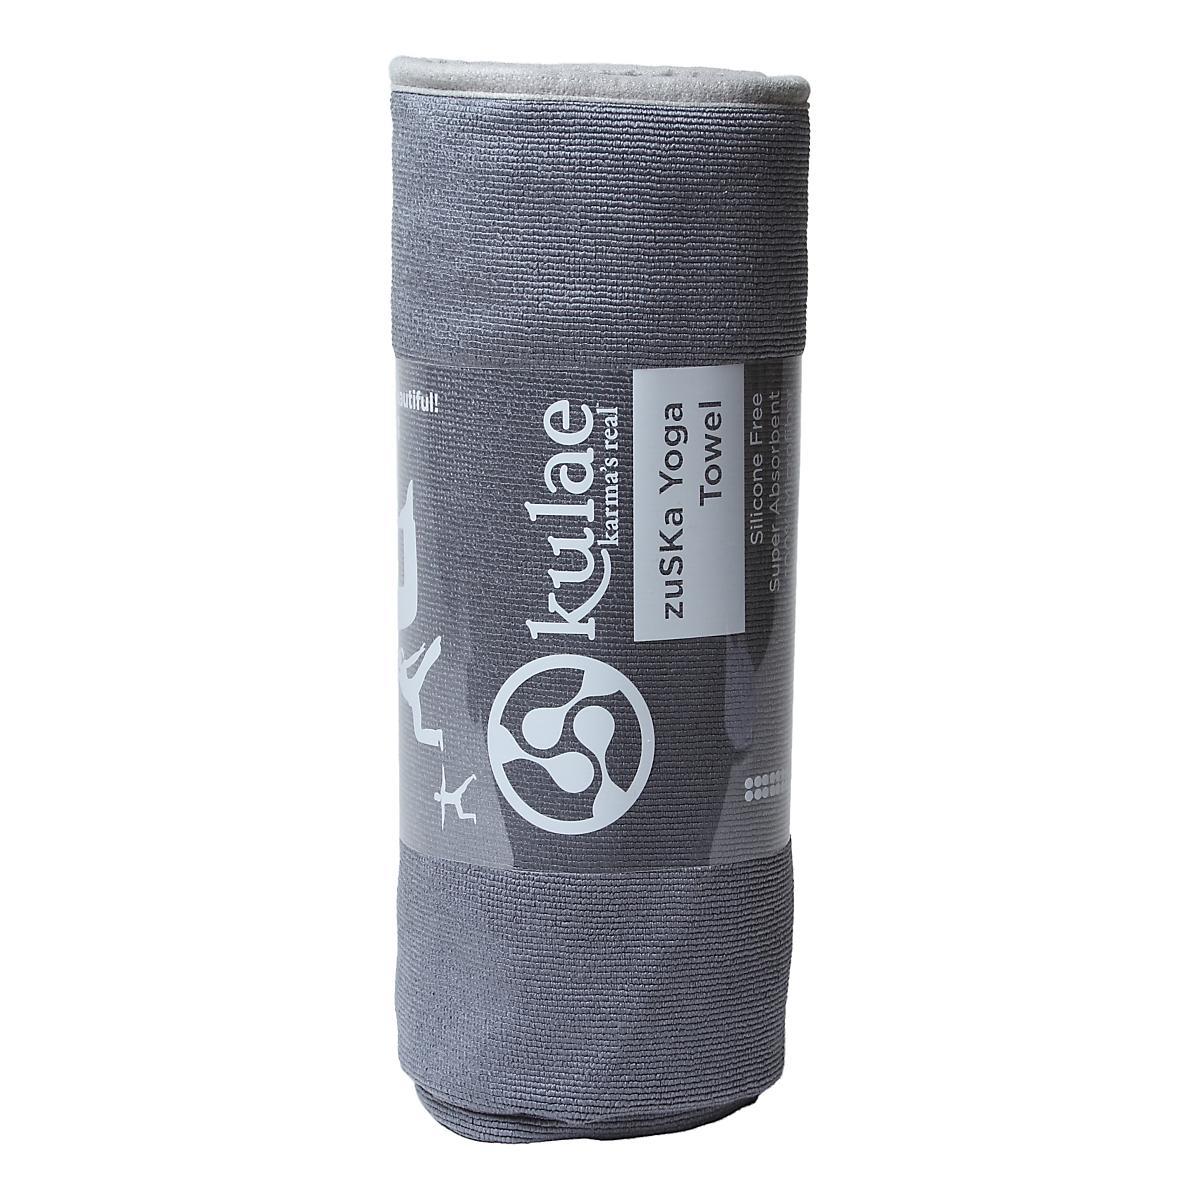 Kulae Zuska Yoga Towel Fitness Equipment At Road Runner Sports